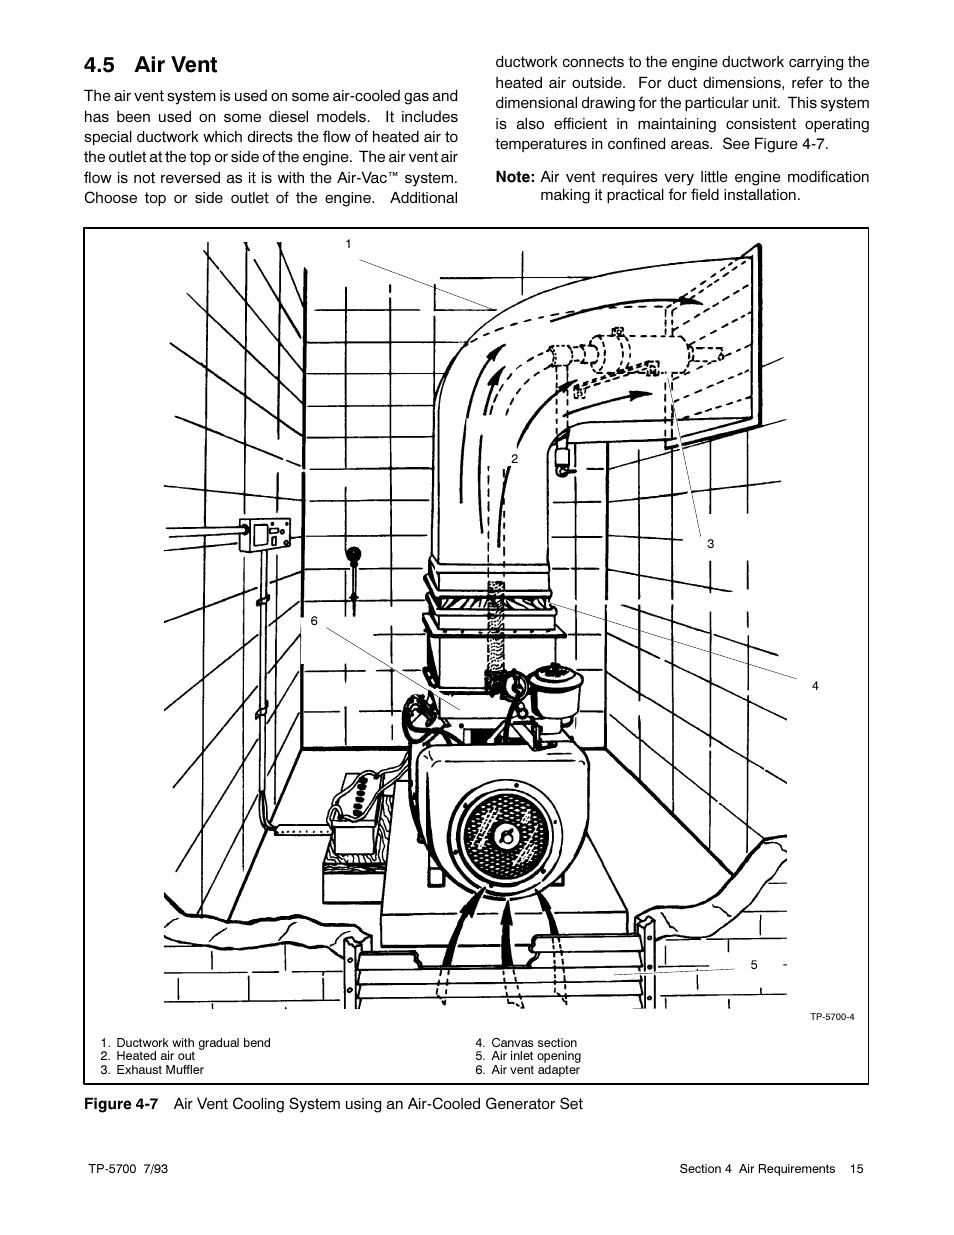 5 air vent | Kohler Generator Sets 20--2800 kW User Manual | Page 27